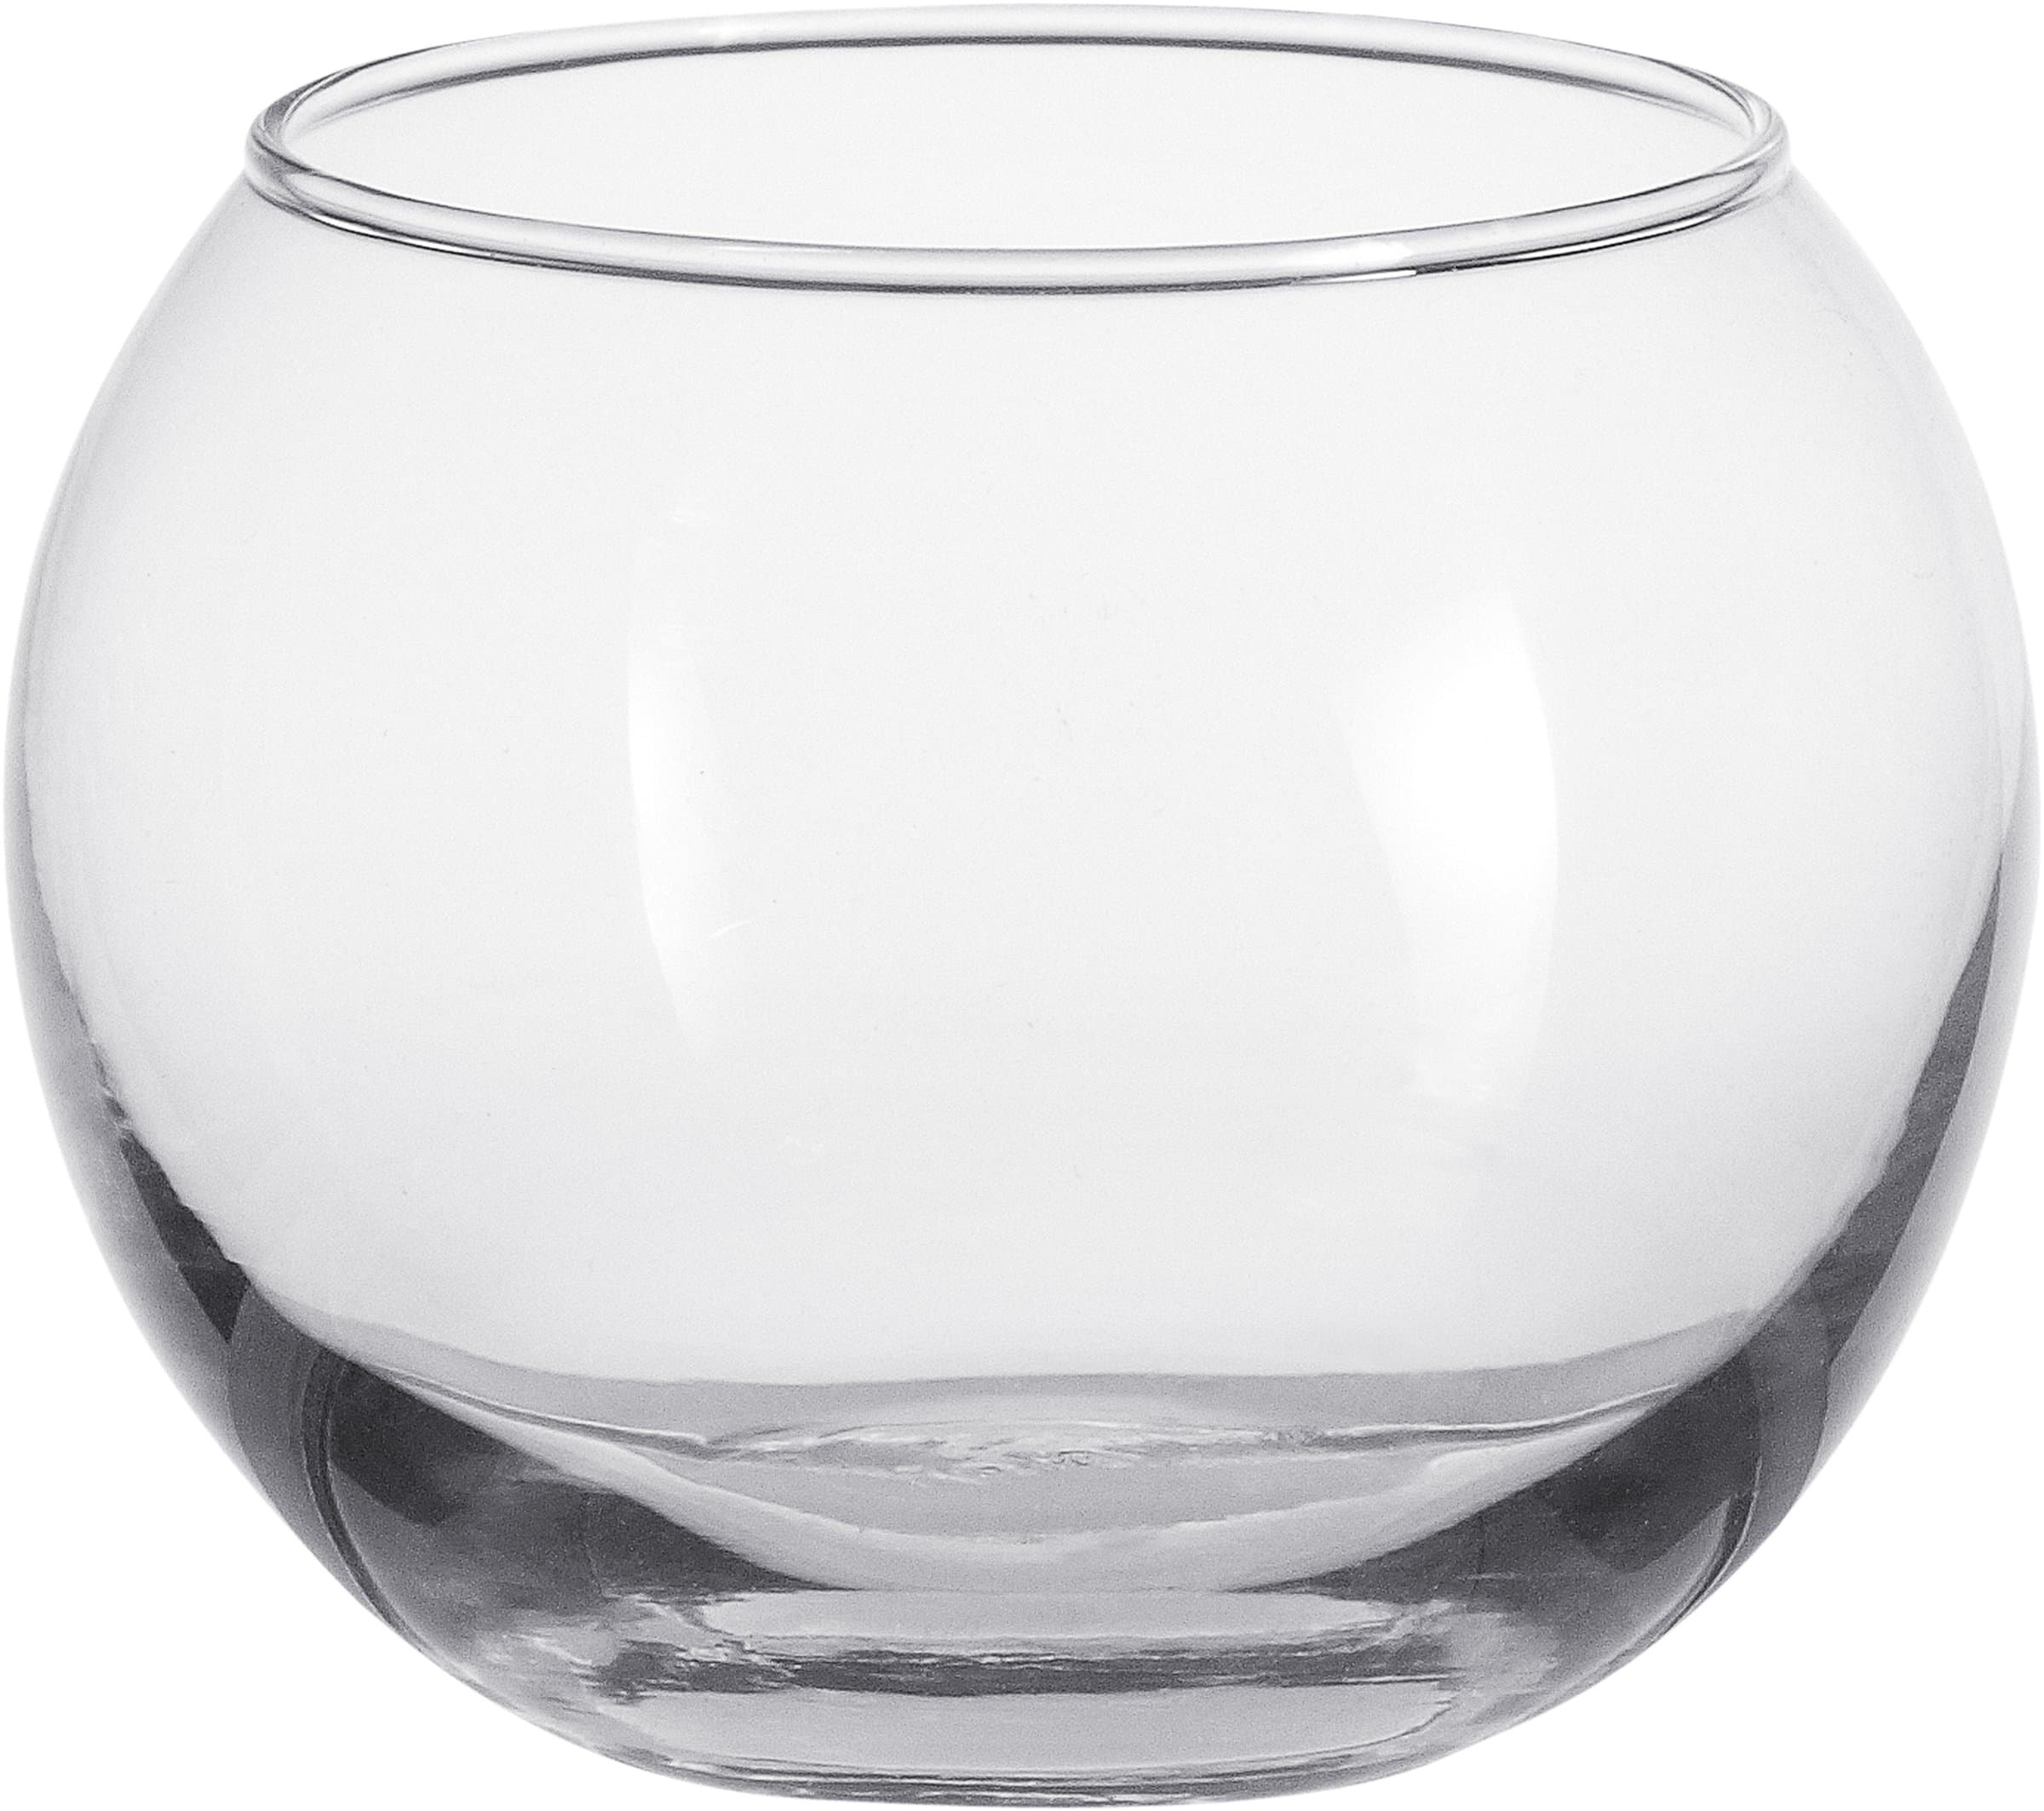 Hakbjl Glass Lumino Bubble Ball